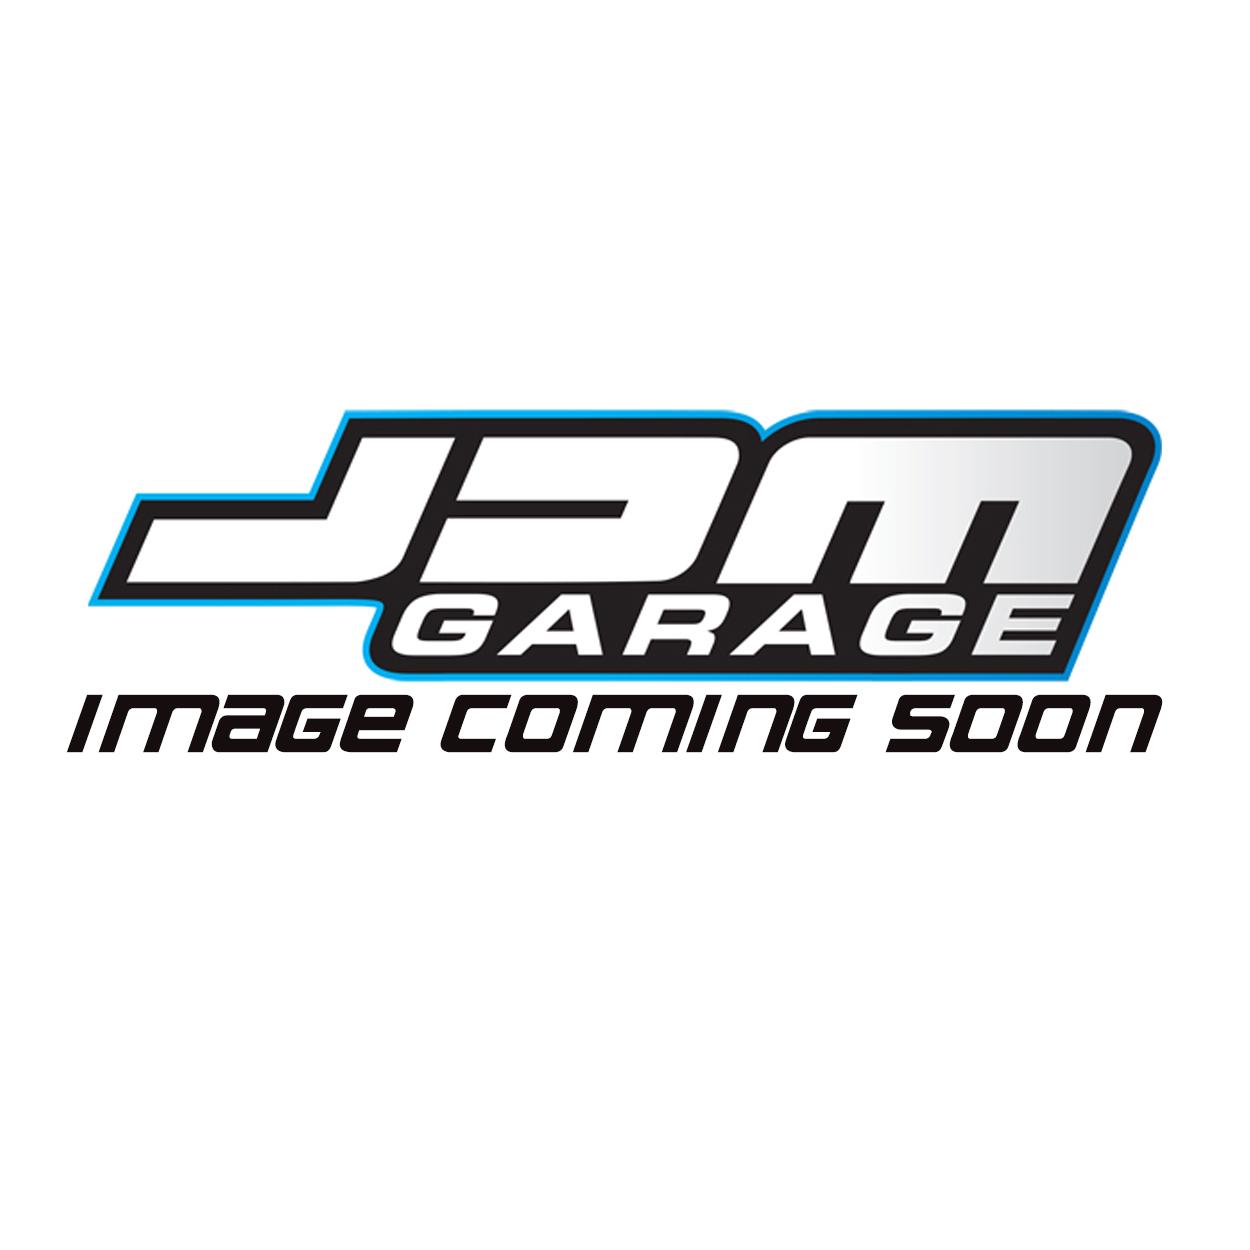 Genuine Nissan OEM Remote Blank Master Key For Nissan Skyline R33 GTST GT-R Stagea RS-Four 260RS H0564-C9918